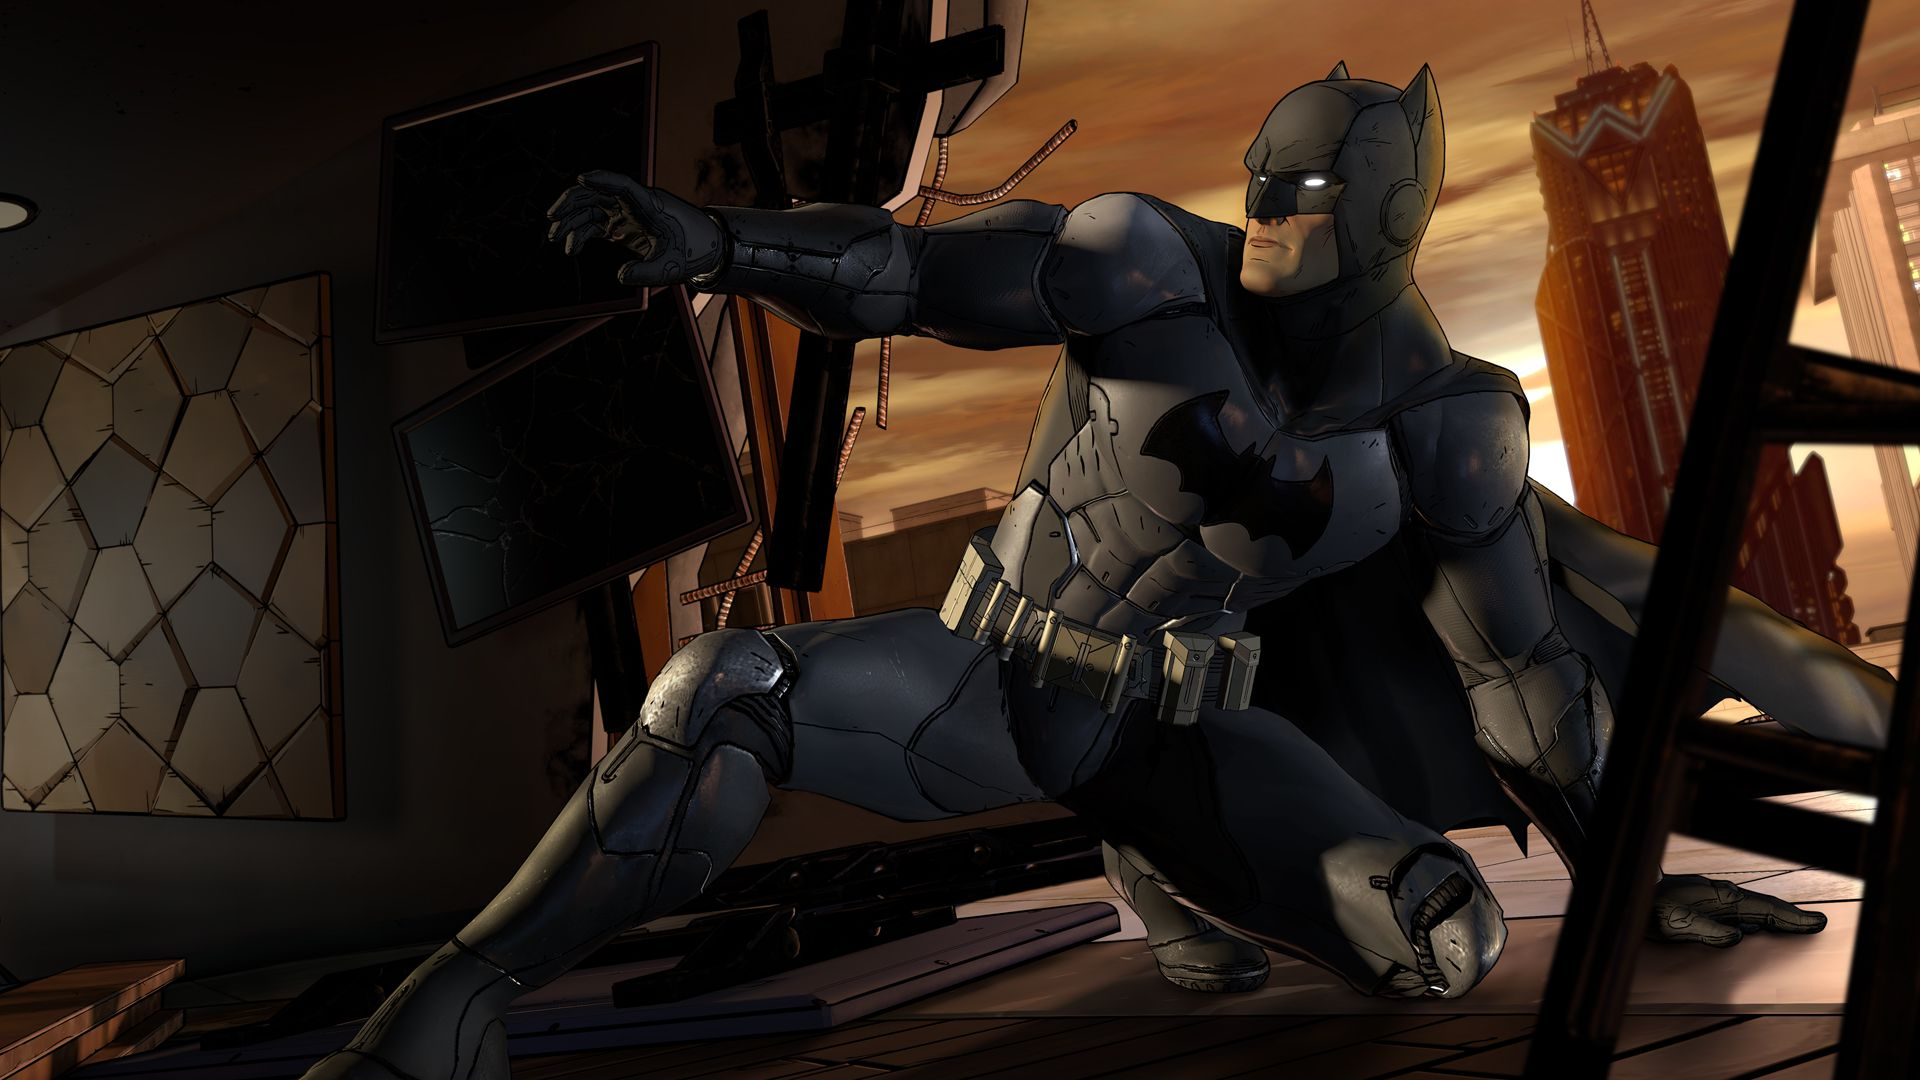 telltale batman ep 2 screen 1